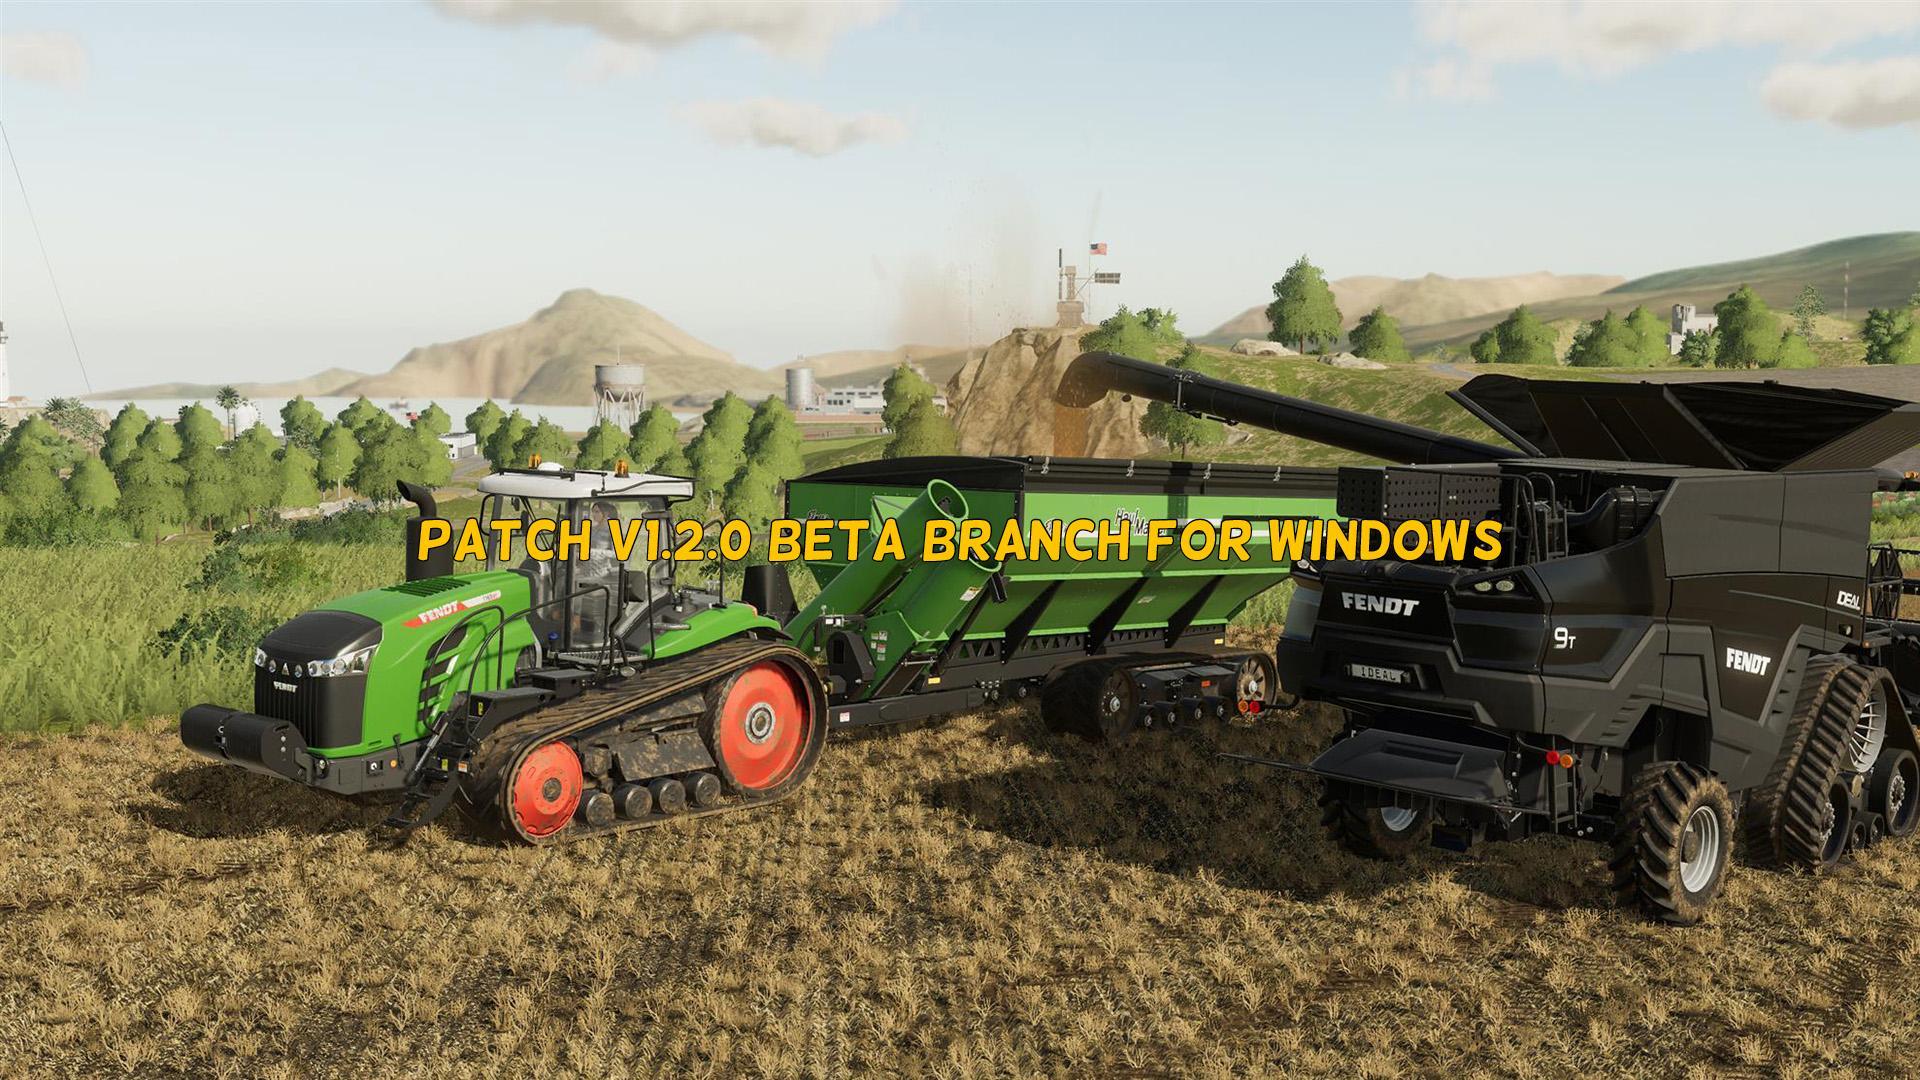 Patch v1 2 0 Beta Branch For Windows FS19 - Farming